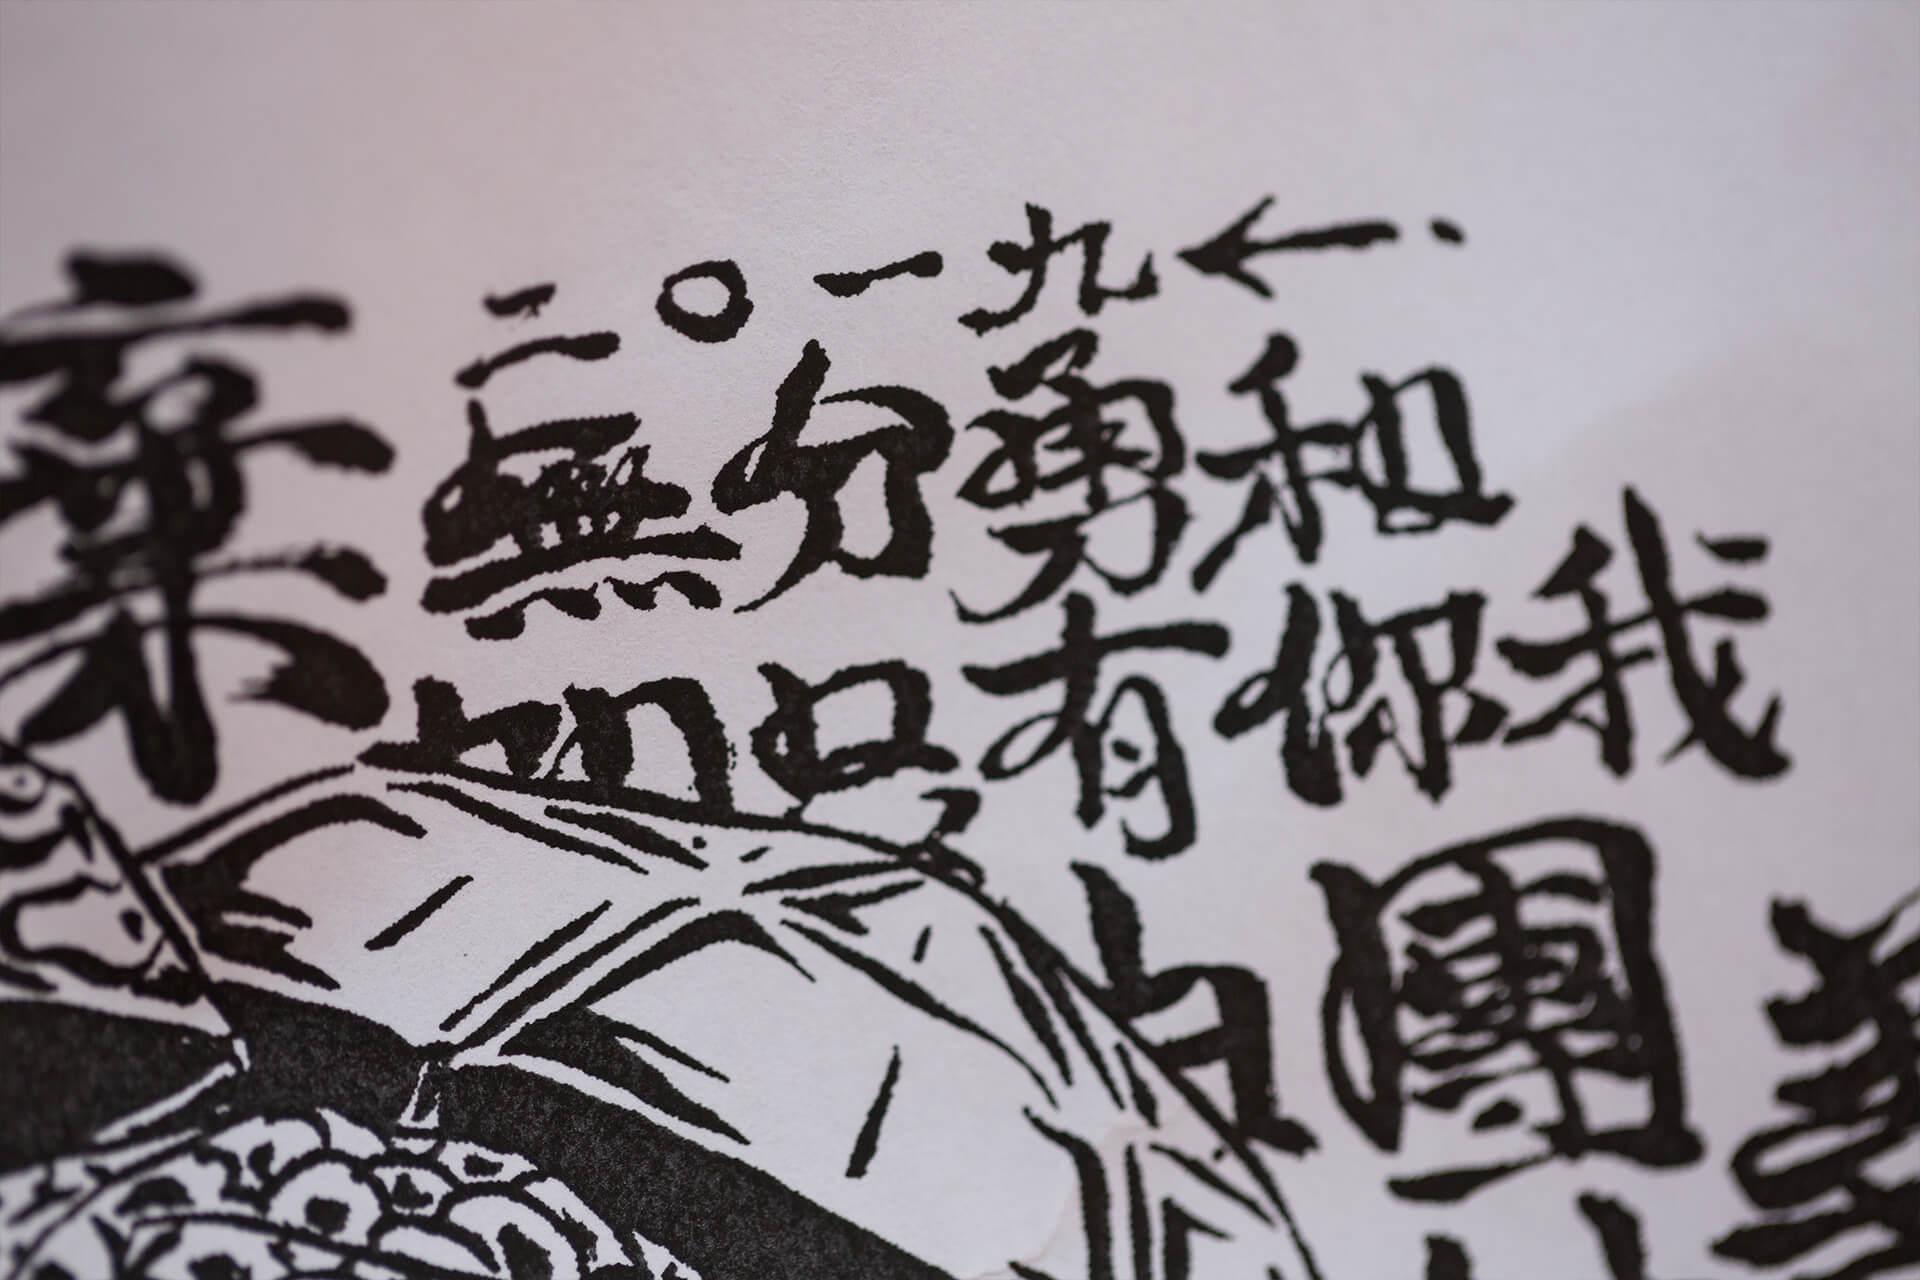 Boms在8.18民陣「流水式集會」後設計海報,他第一句寫下的就是「無分勇和,只有你我」,回應當日勇武派與和理非齊上齊落的回憶。